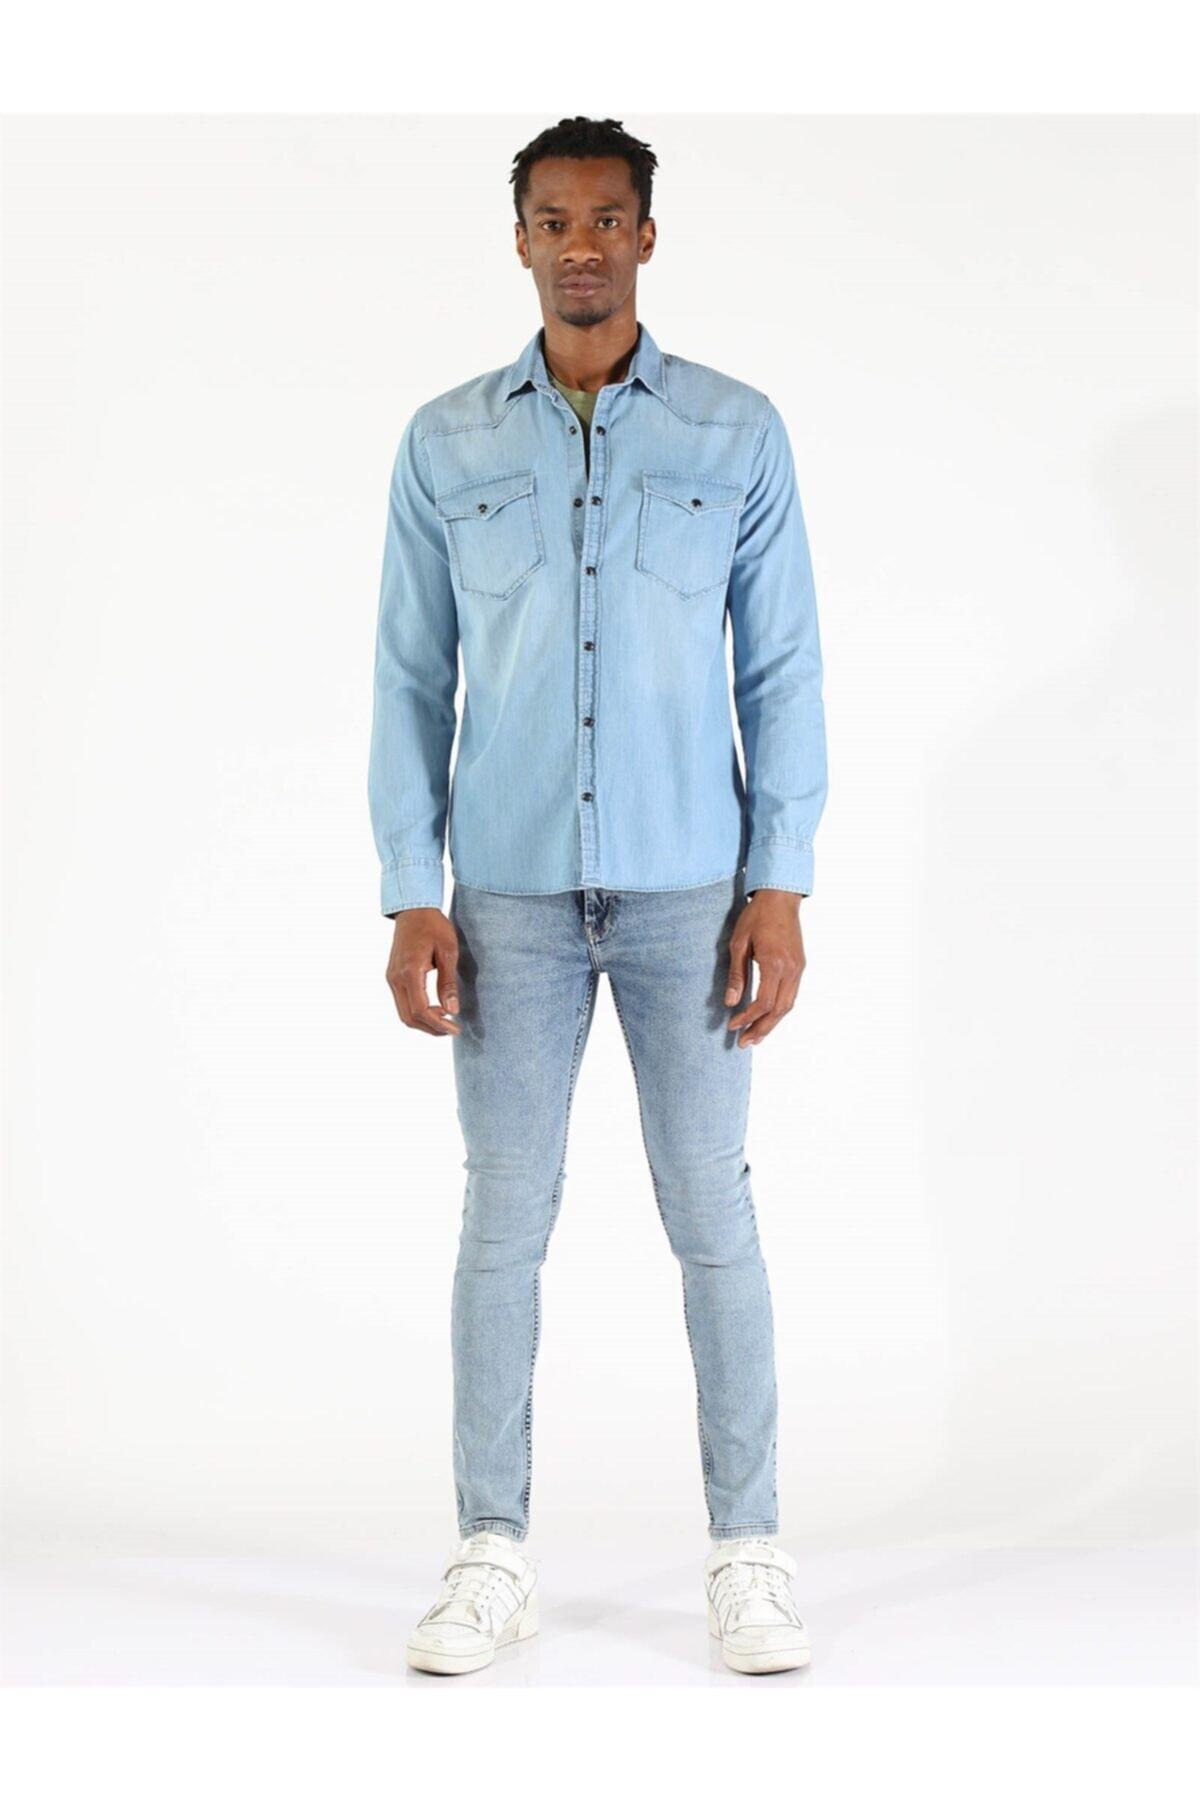 Twister Jeans Twıster Jeans 1704-09 Erkek Çıtçıtlı Çift Cepli Kot Gömlek 1